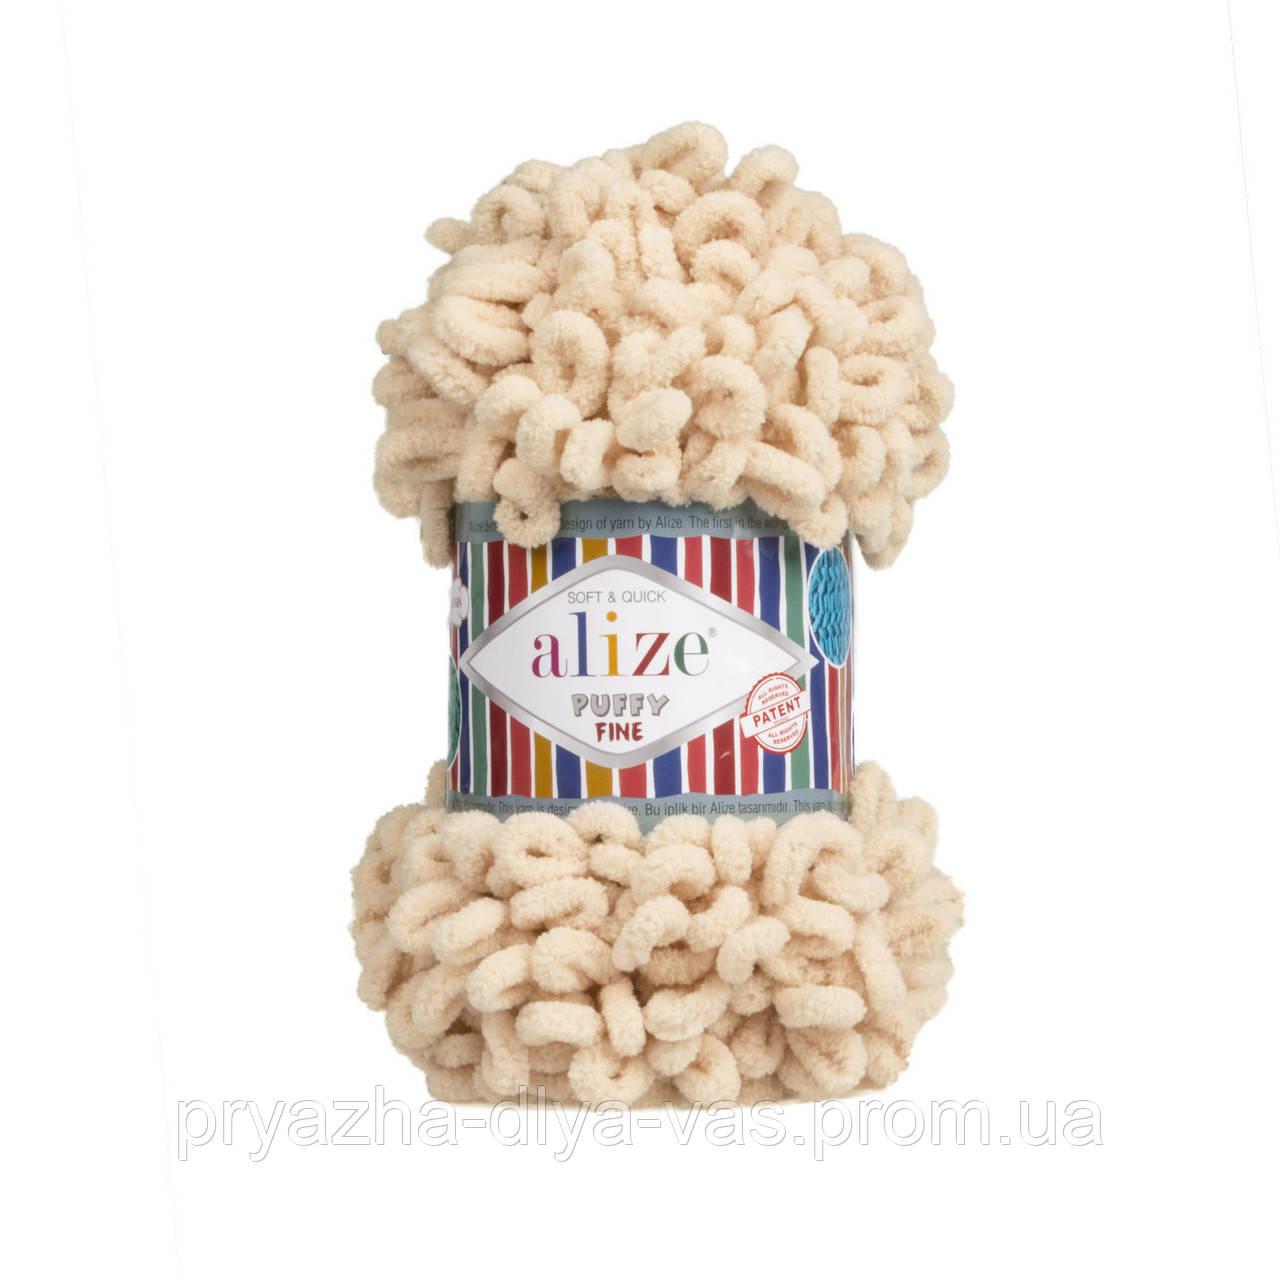 Пряжа для вязания руками (100%-микрополиэстер, 100г/14м) Alize PUFFY FINE 310 (медовый)